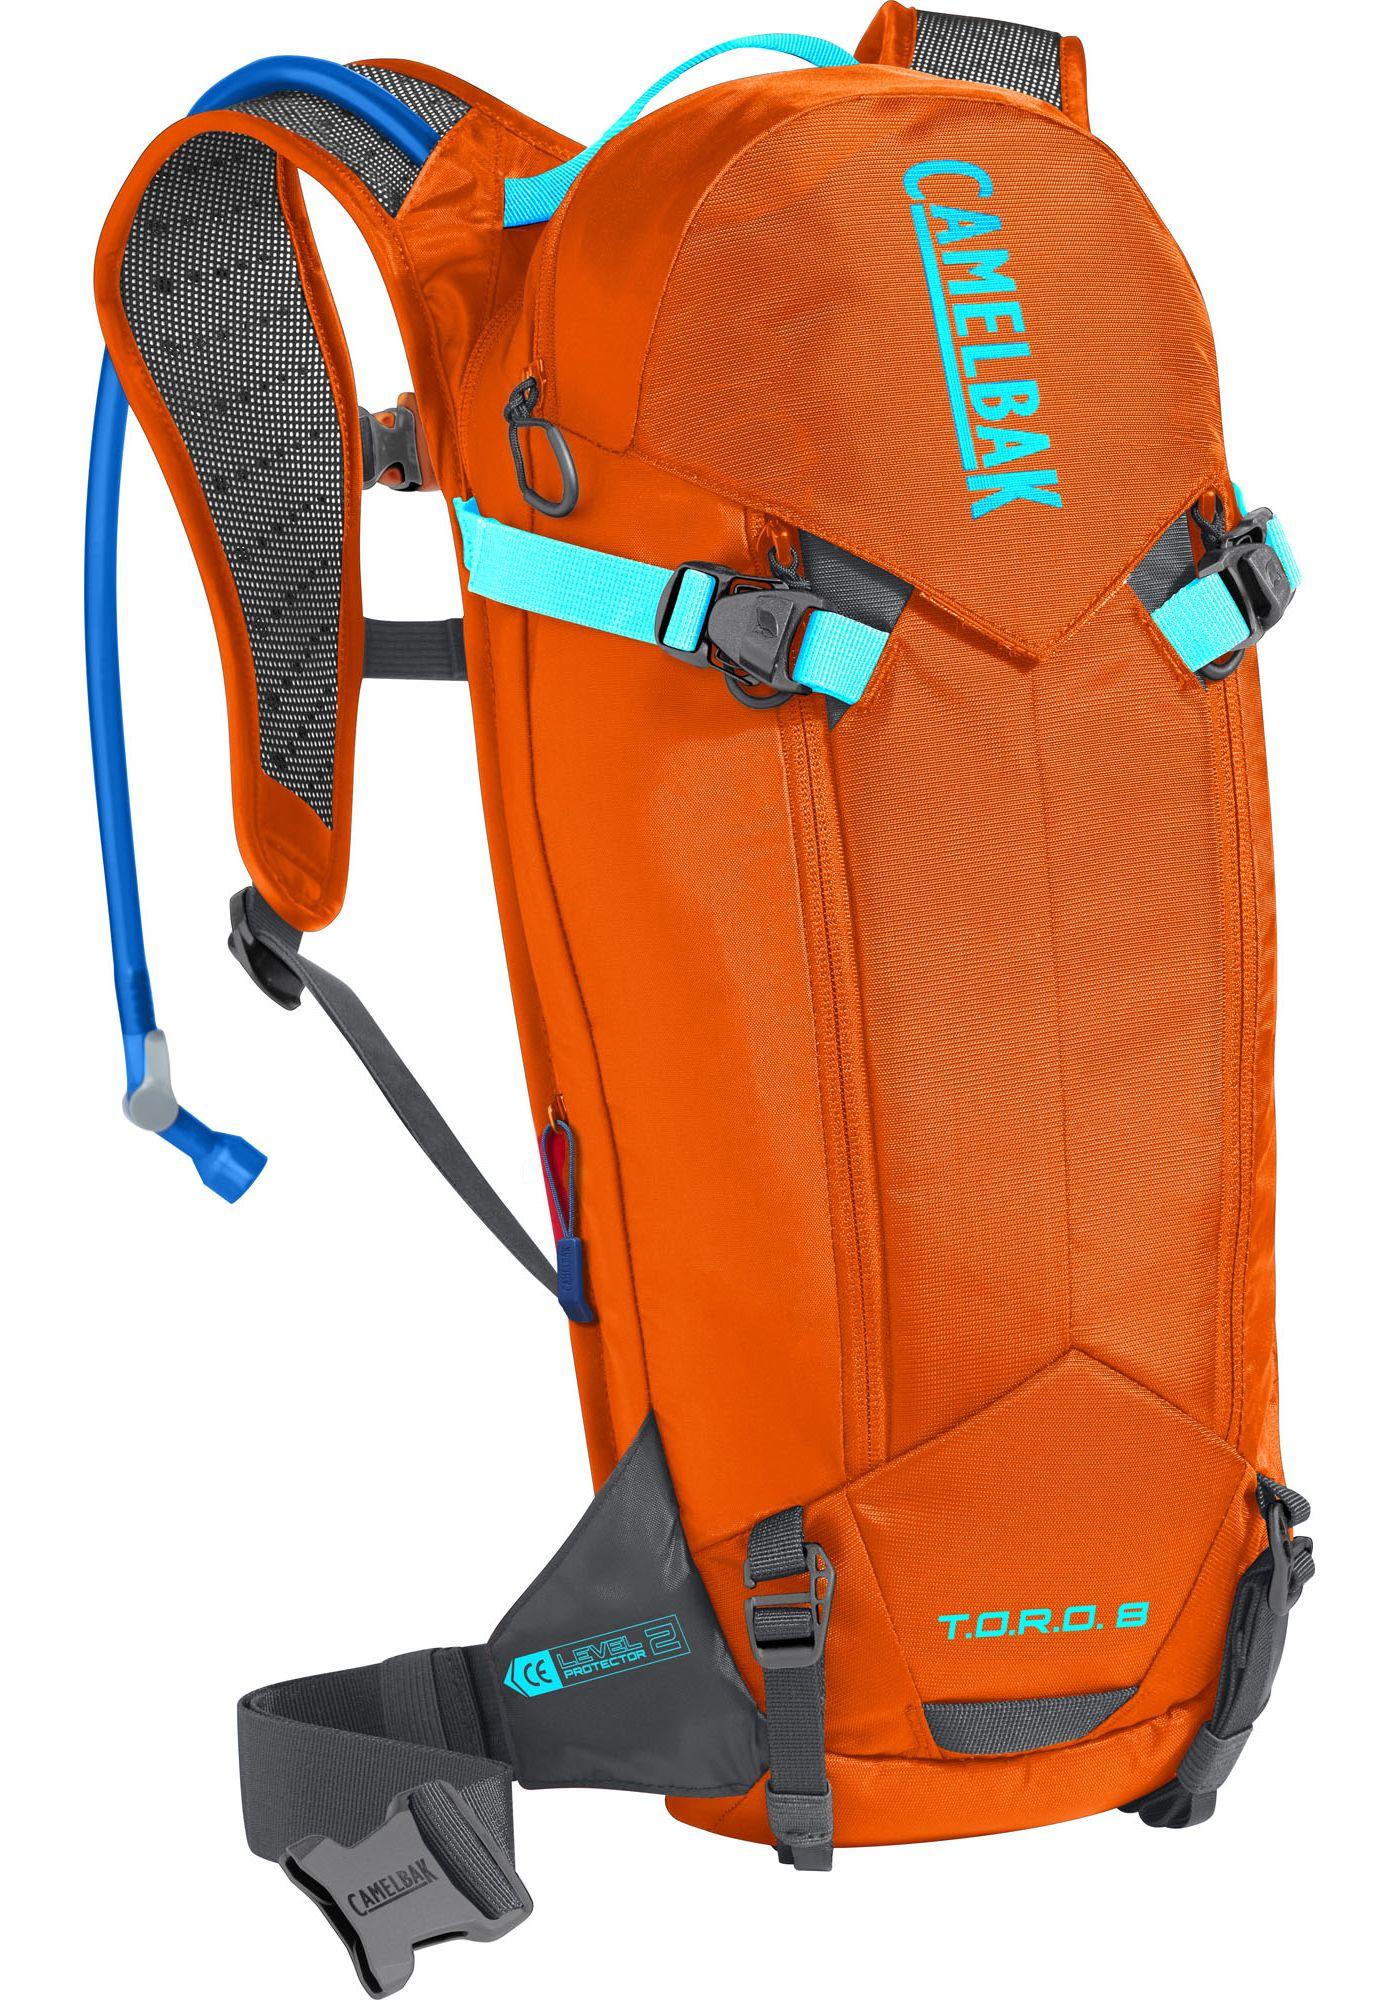 CamelBak T.O.R.O Protector 8 100 oz. Hydration Pack